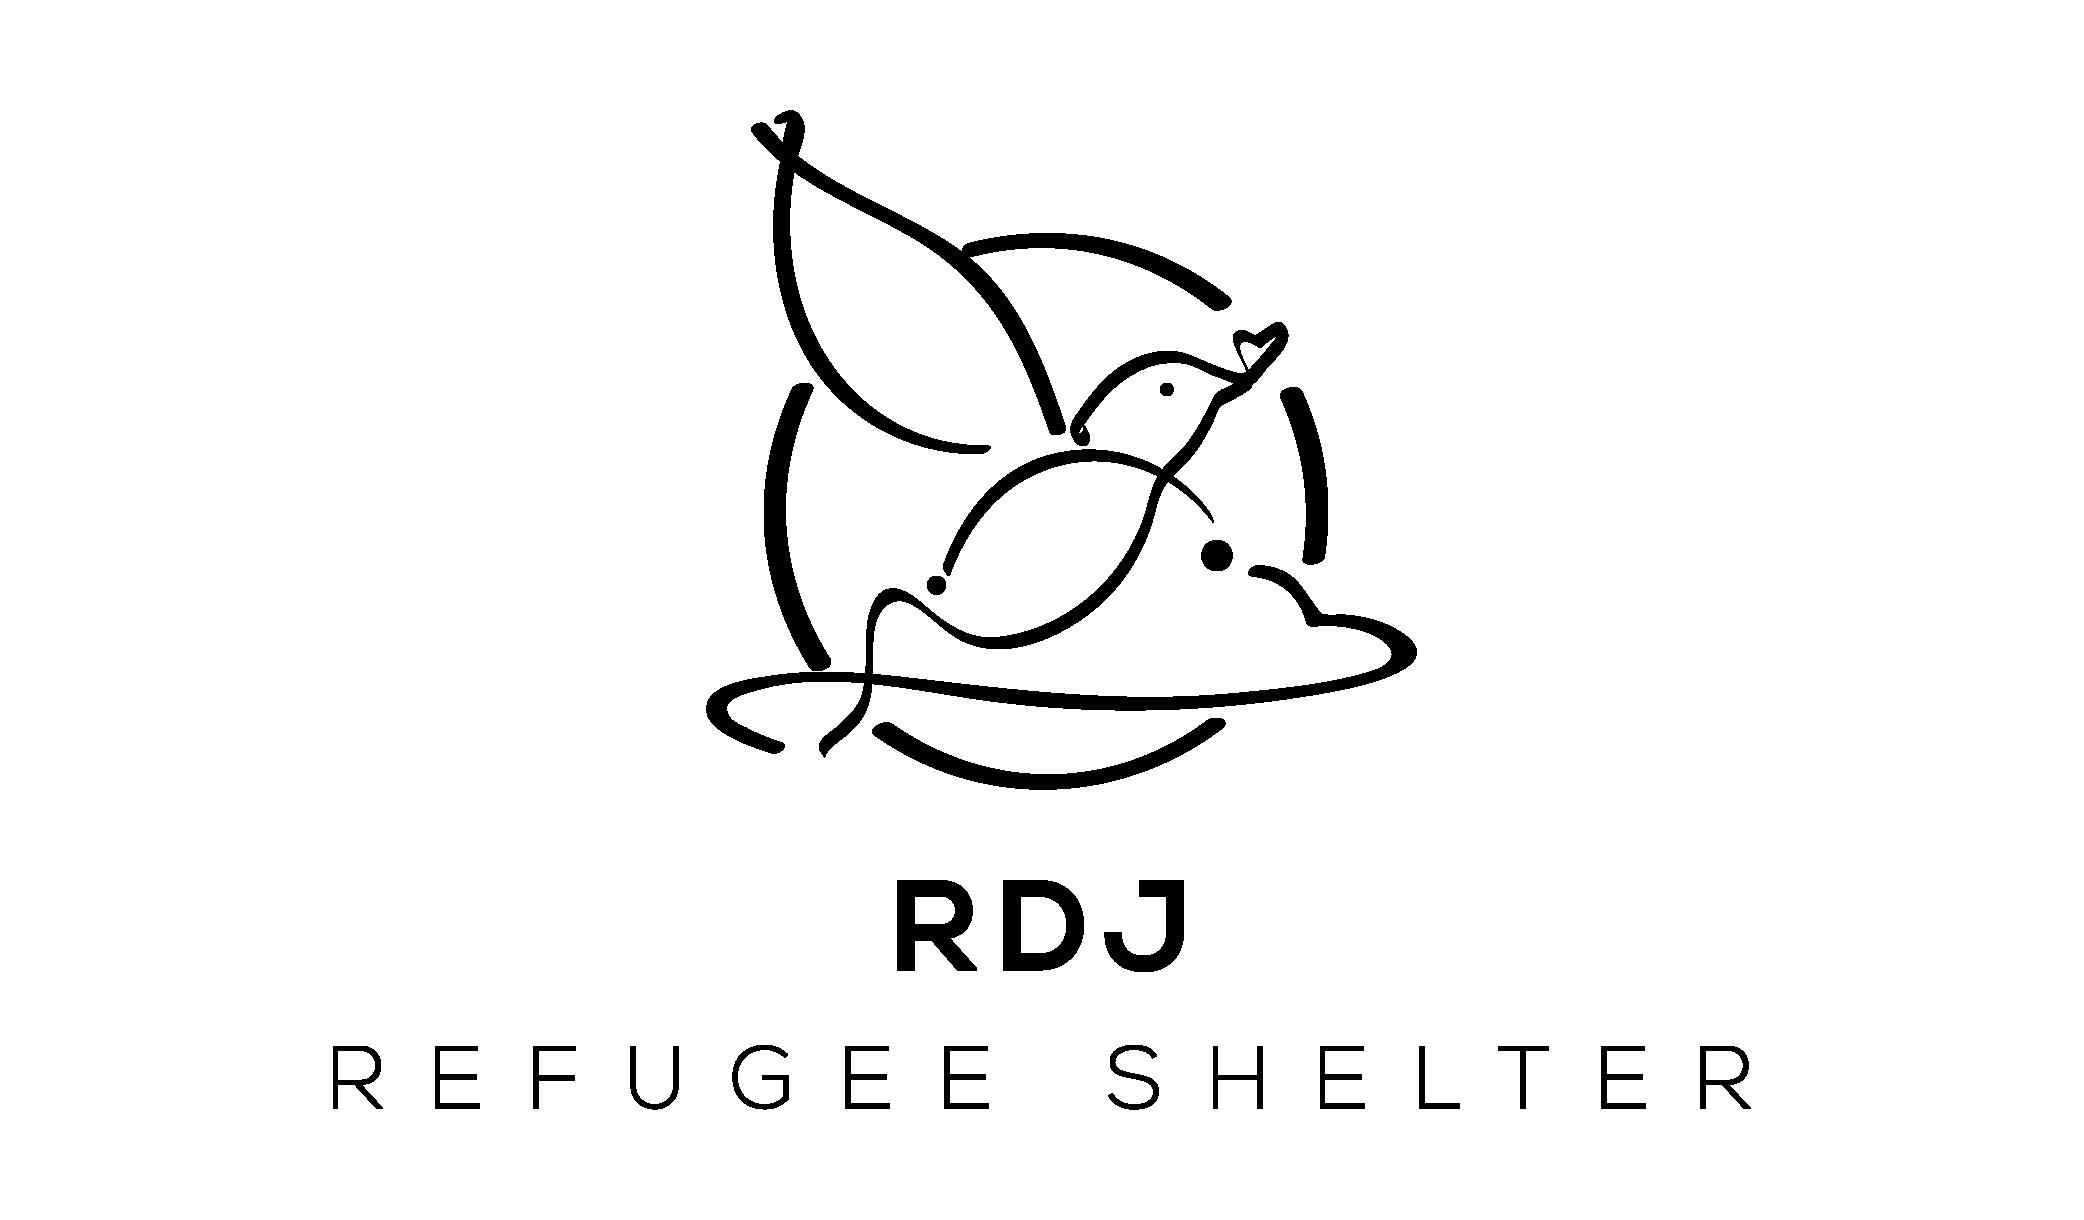 rdj-01-01.png